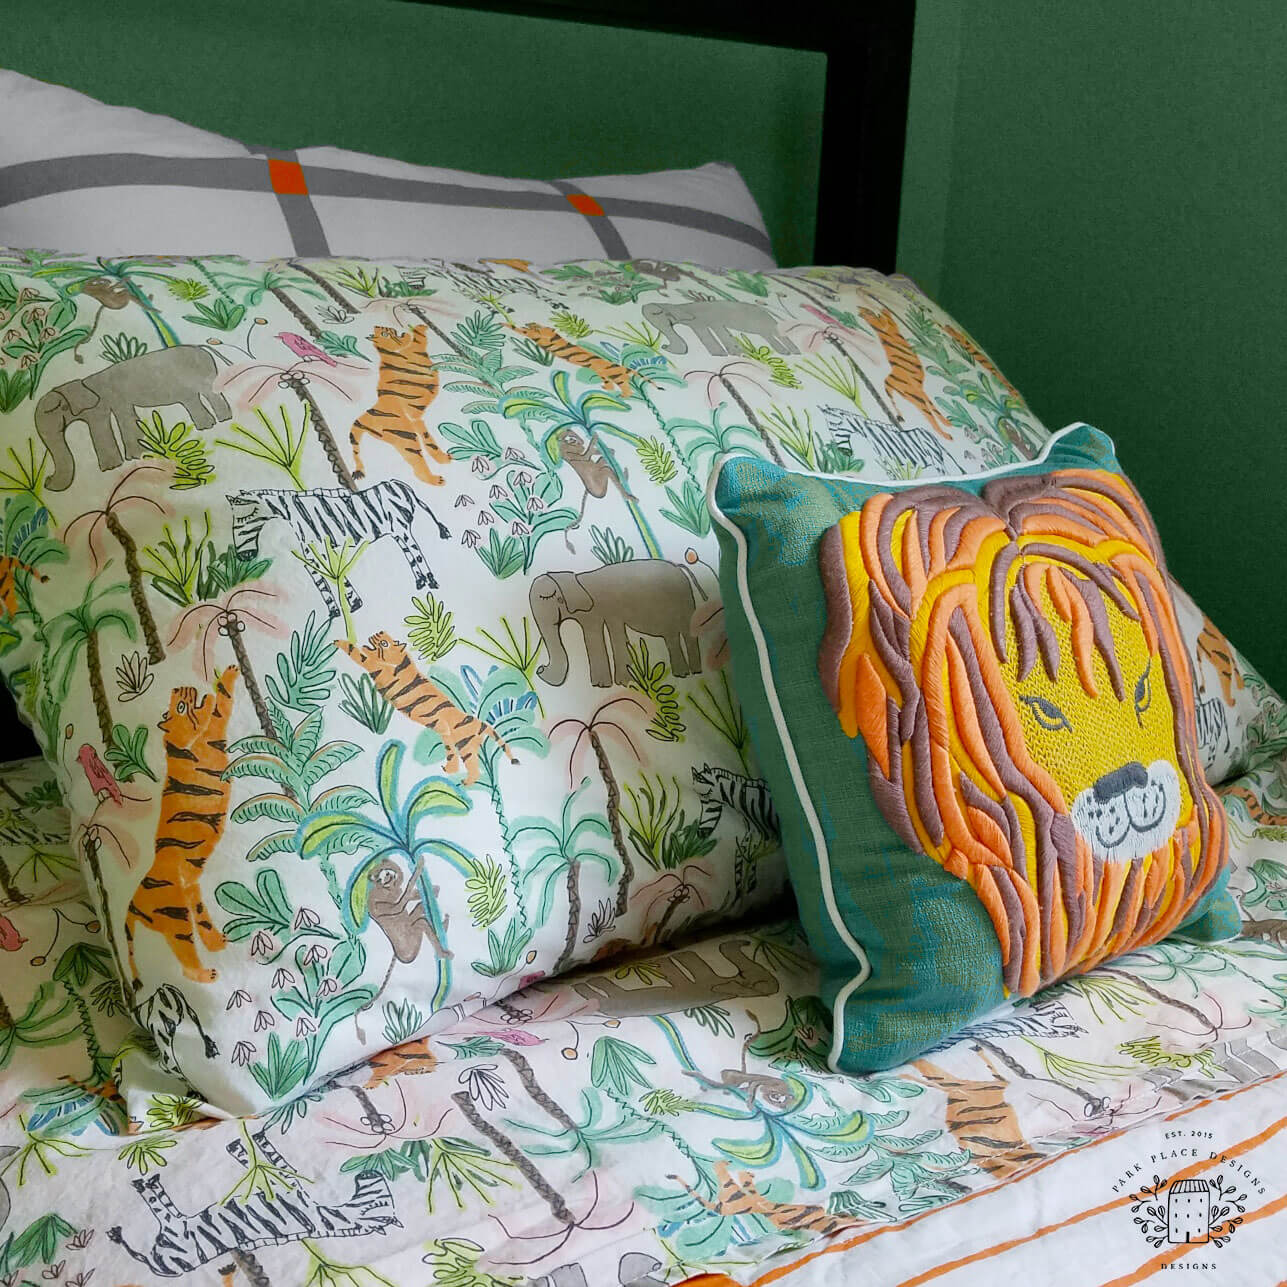 justina blakeney jungalino bedding online kids interiors park place designs.jpg